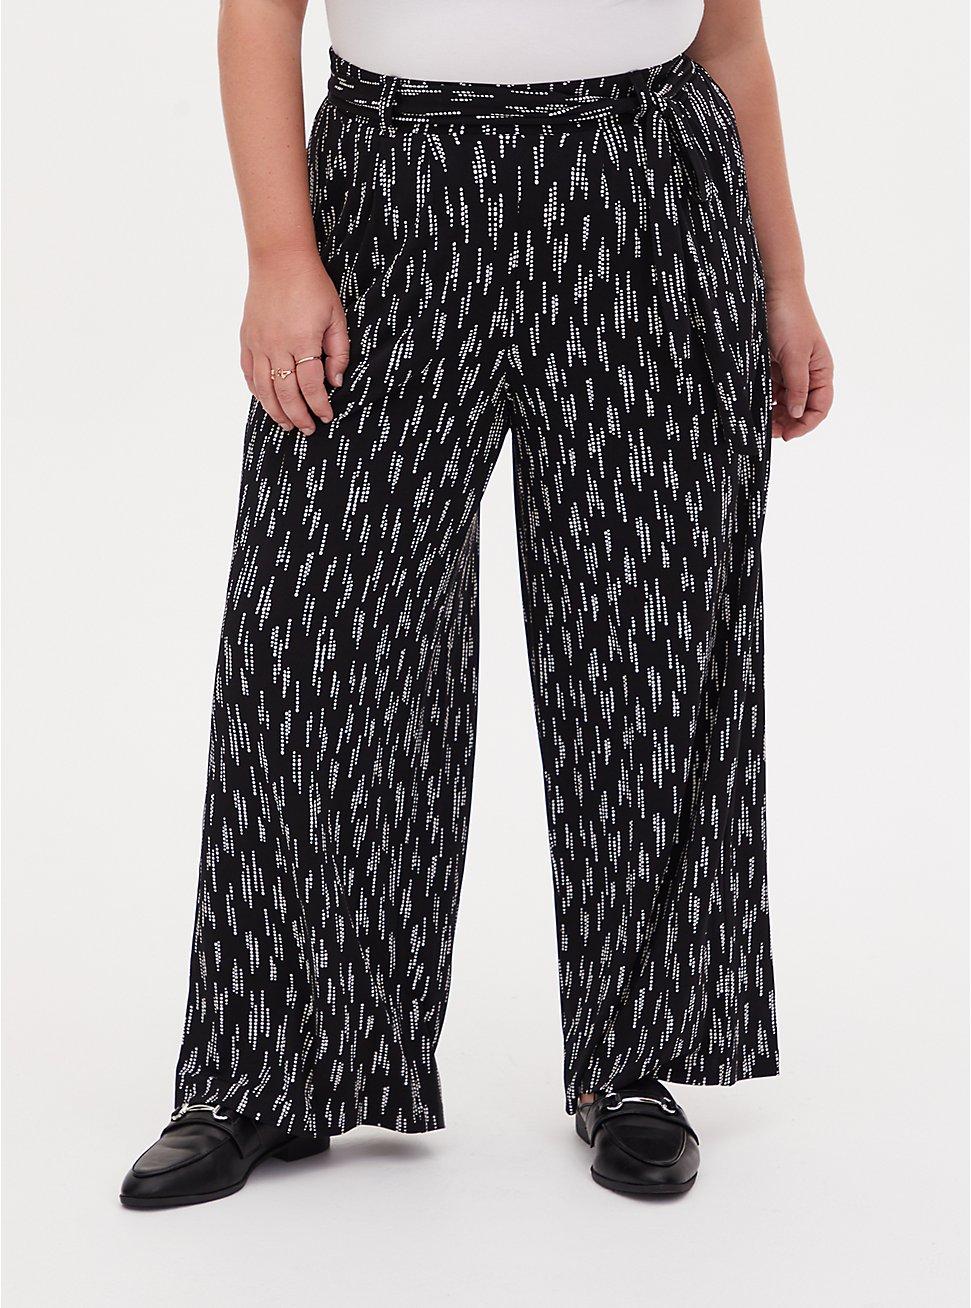 Black Dotted Stripe Studio Knit Self Tie Wide Leg Pant, STRIPED DOTS, hi-res